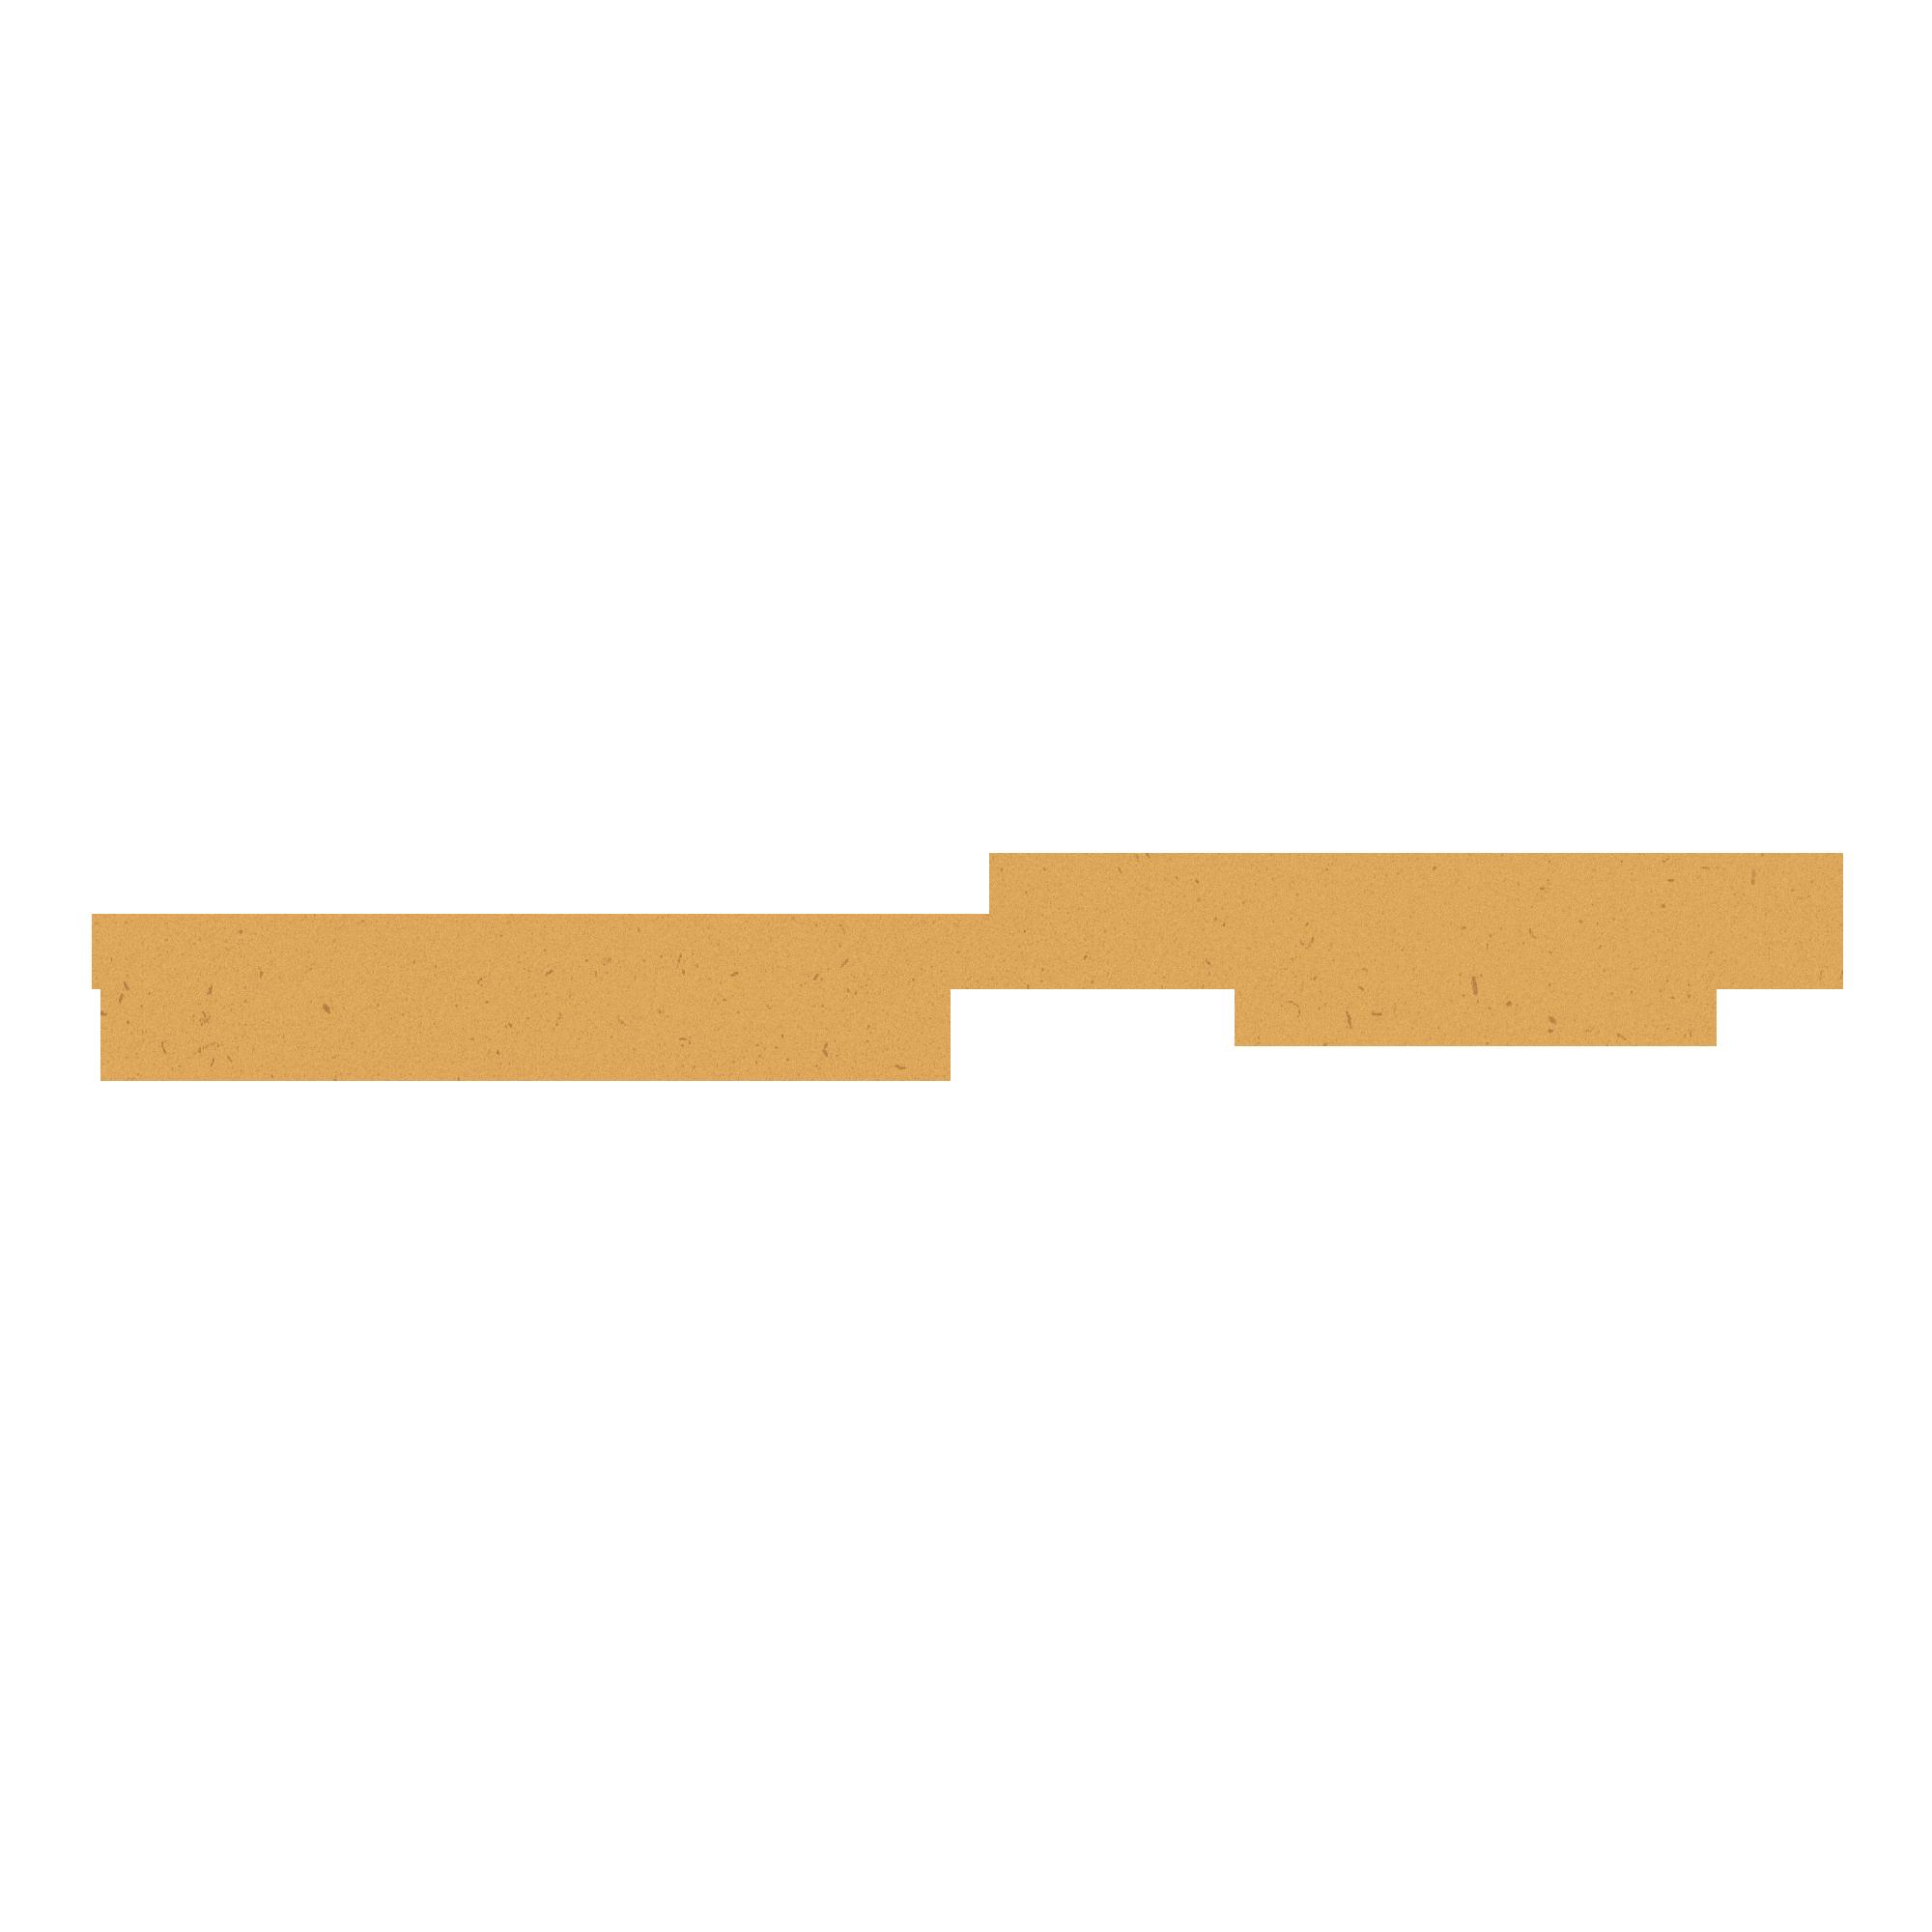 Ocean Wave Citrus Texture.png